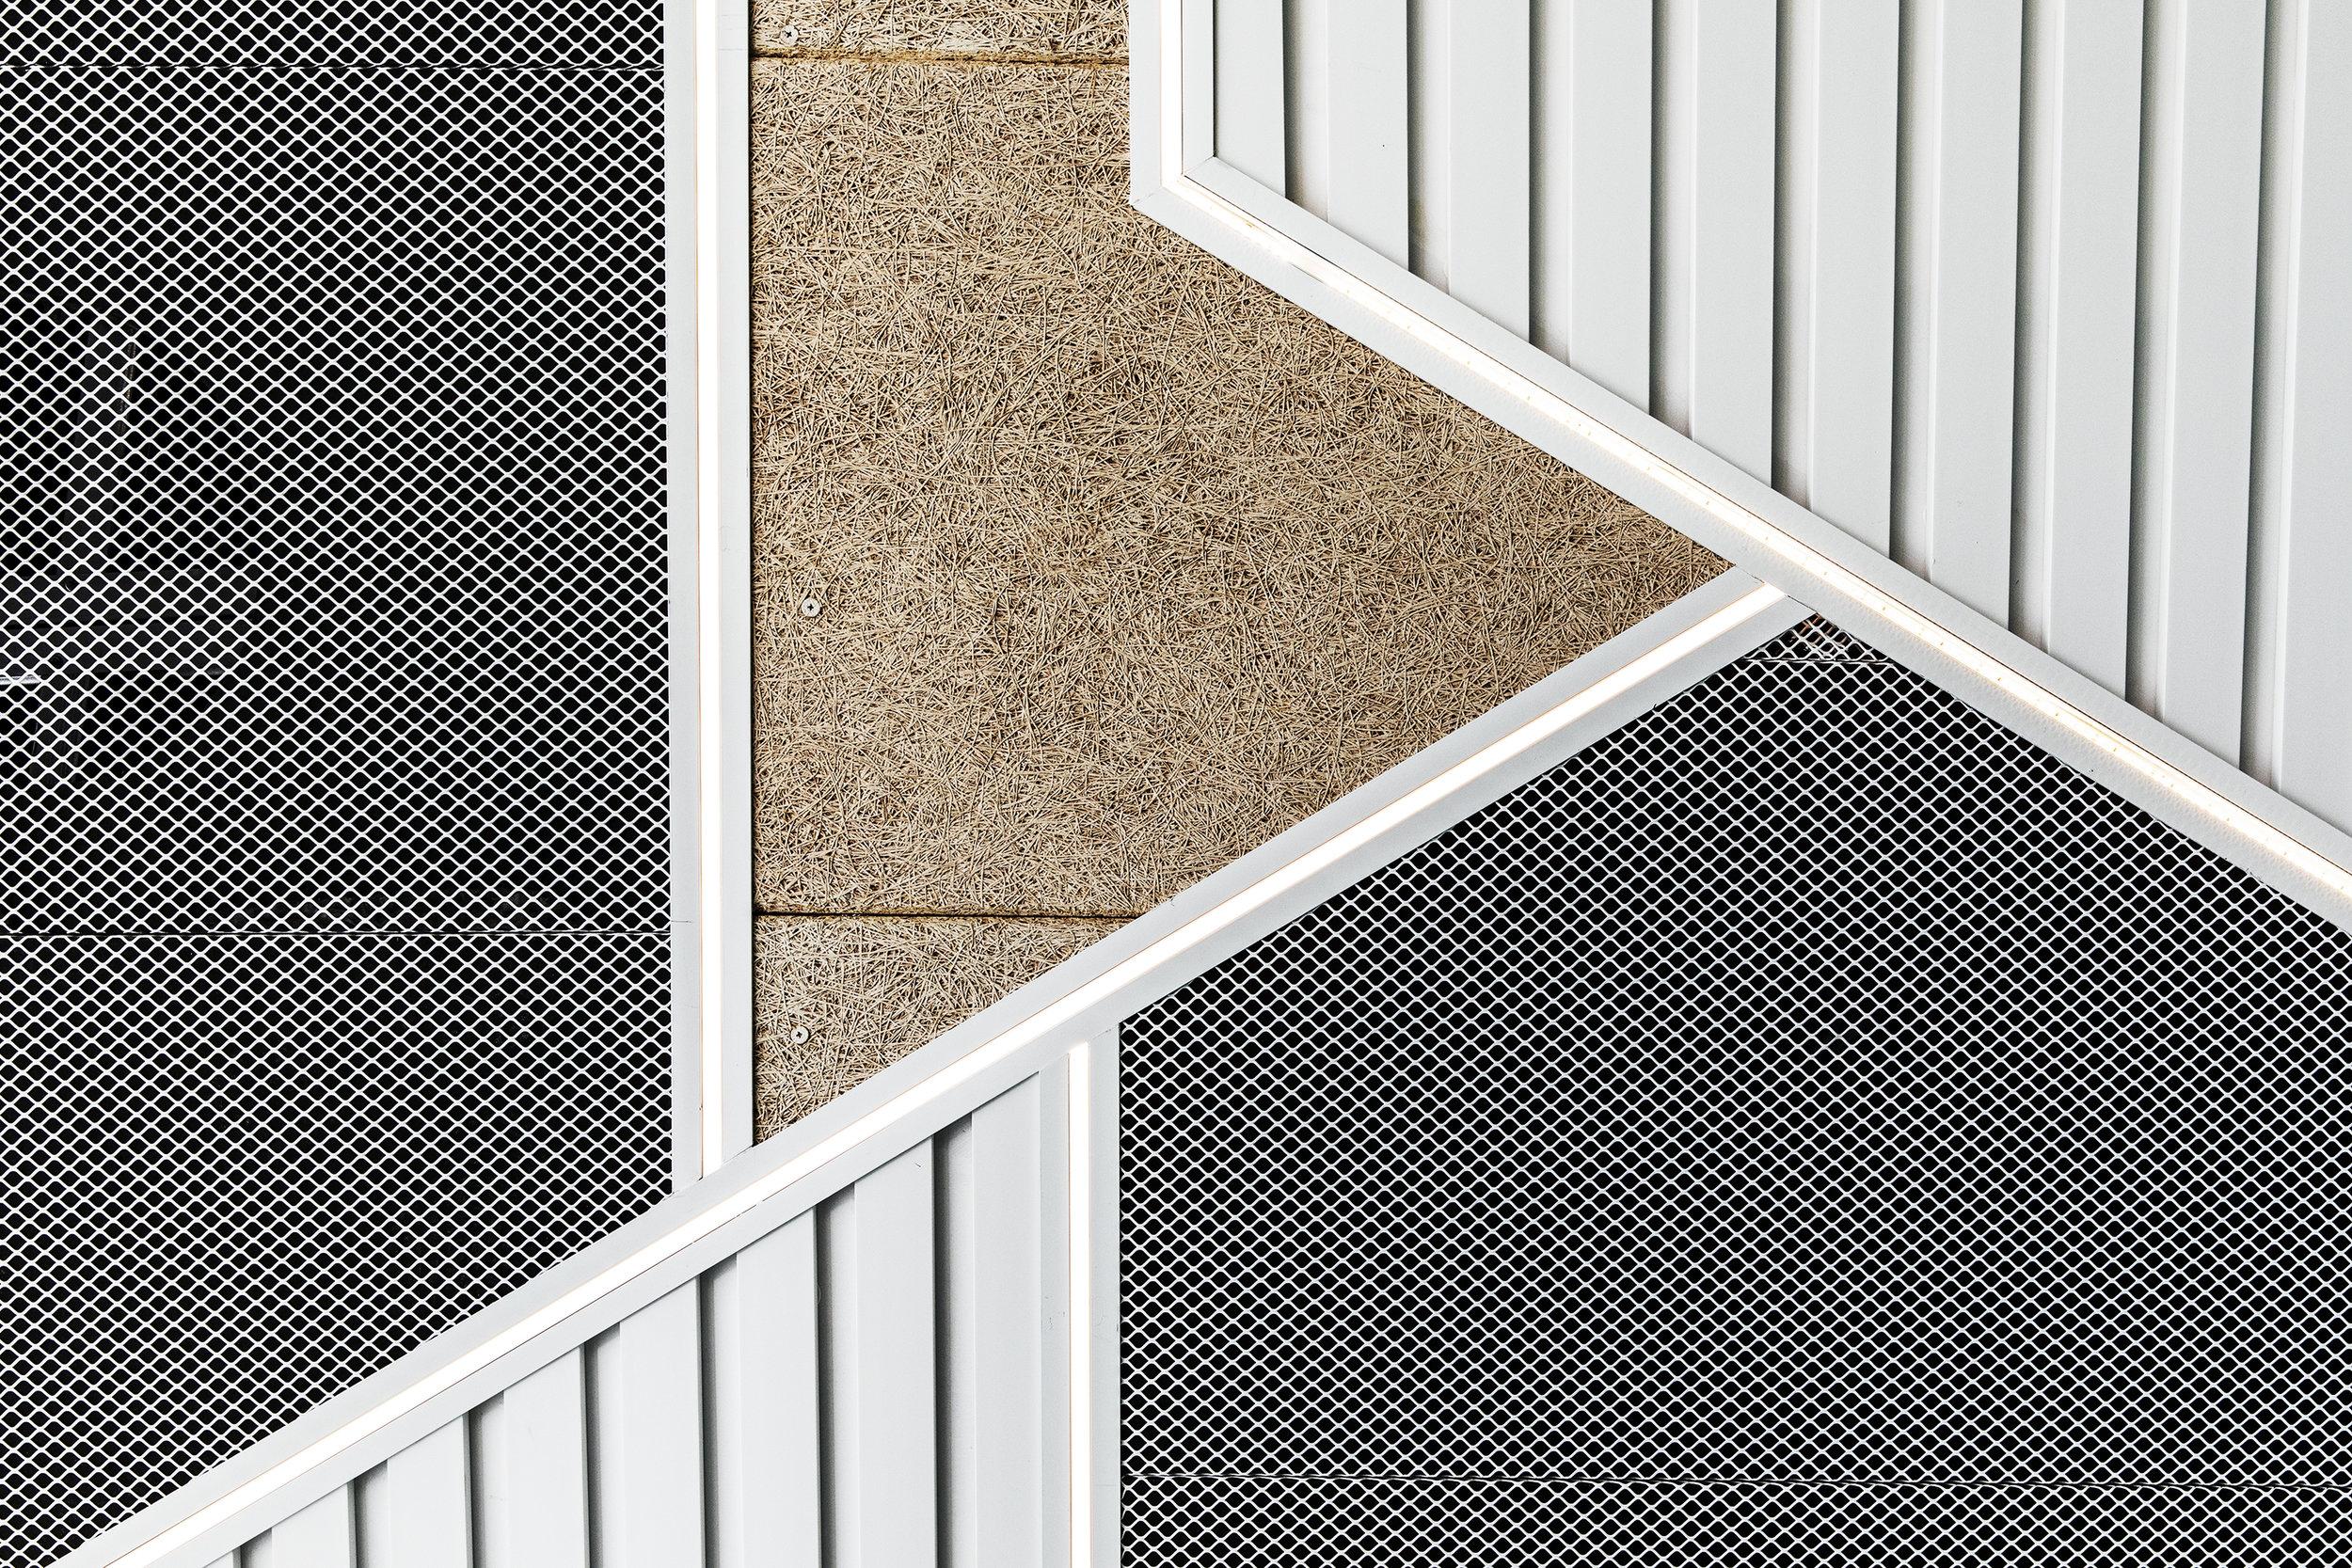 רואי דוד אדריכלות - אדריכל - נטורל אינטליג'נס - ROY DAVID - ARCHITECTURE - ARCHITECT - NI (45).jpg